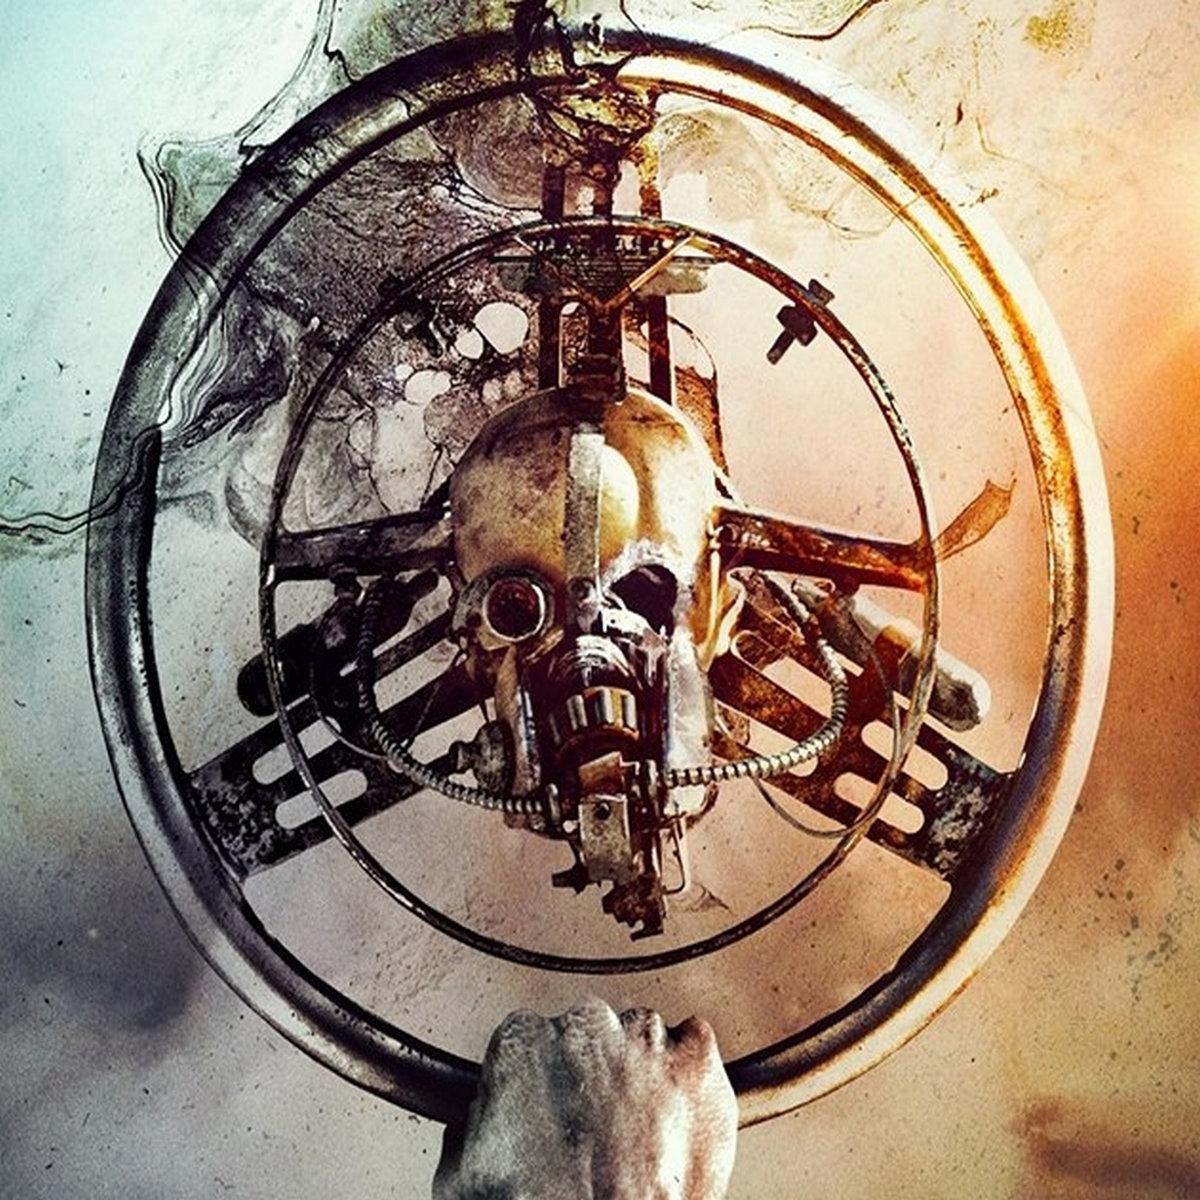 Interceptor (feat  Electric Mirror) 146 bpm - C# | psyberpunk